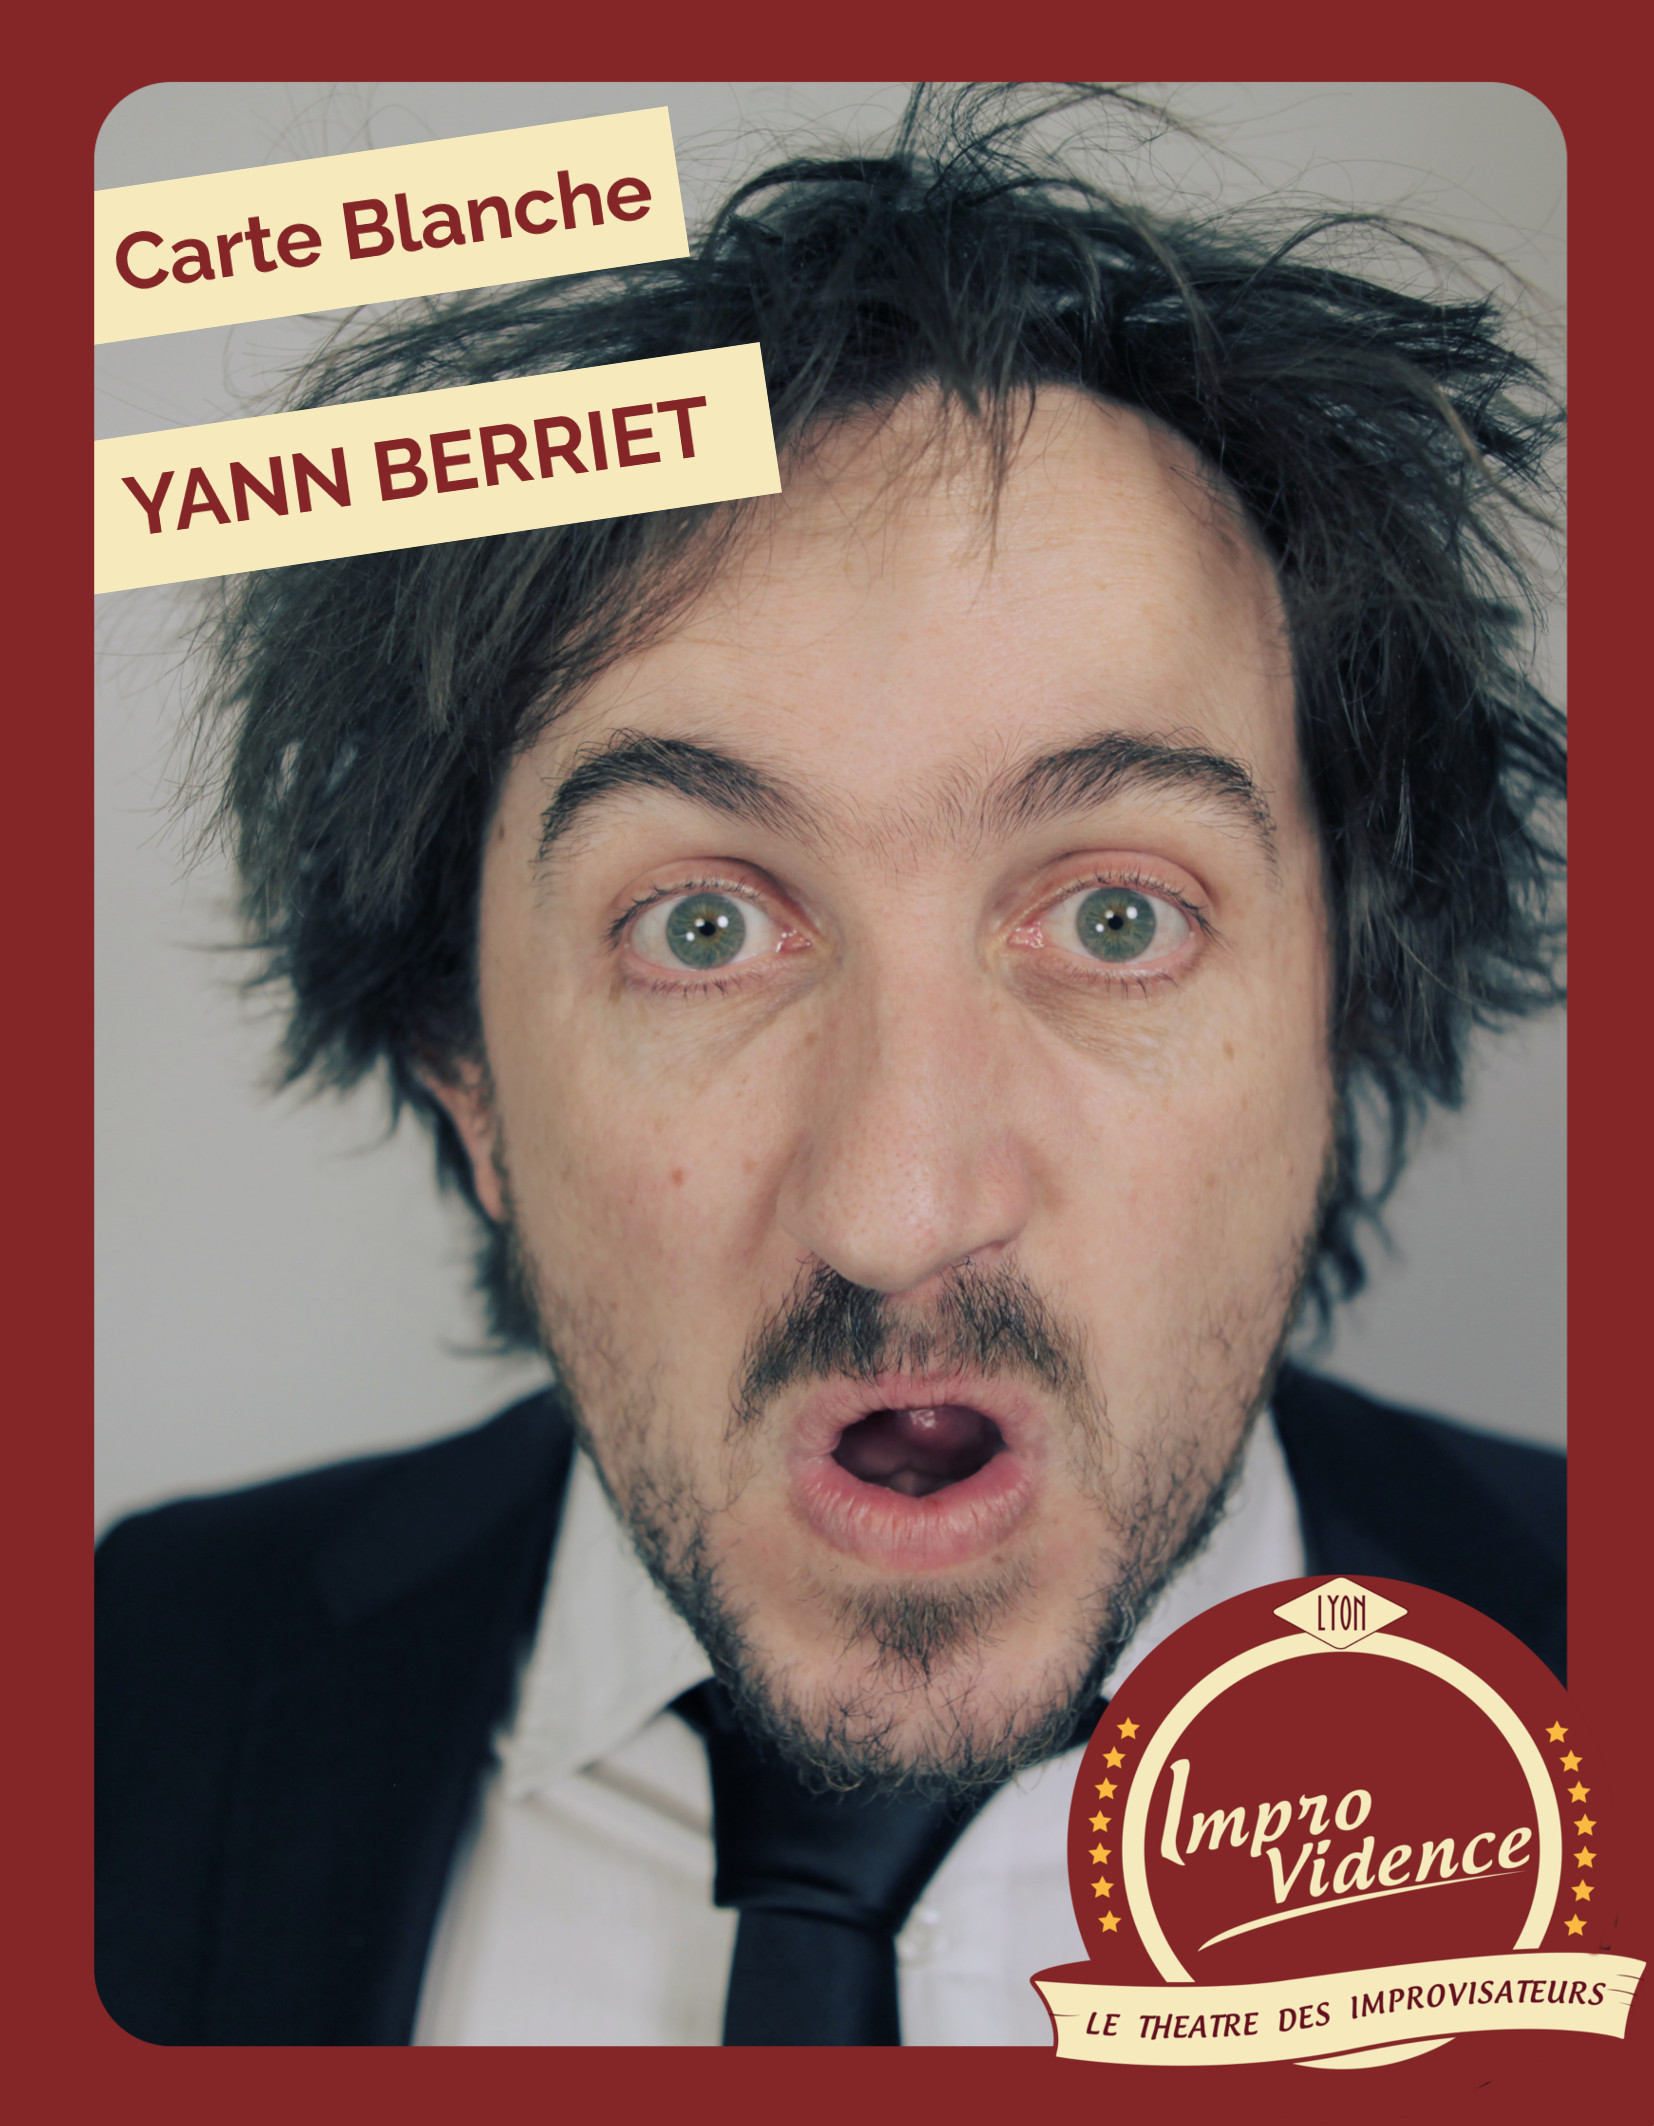 Agenda Spectacle | Improvidence | Carte blanche à Yann Berriet